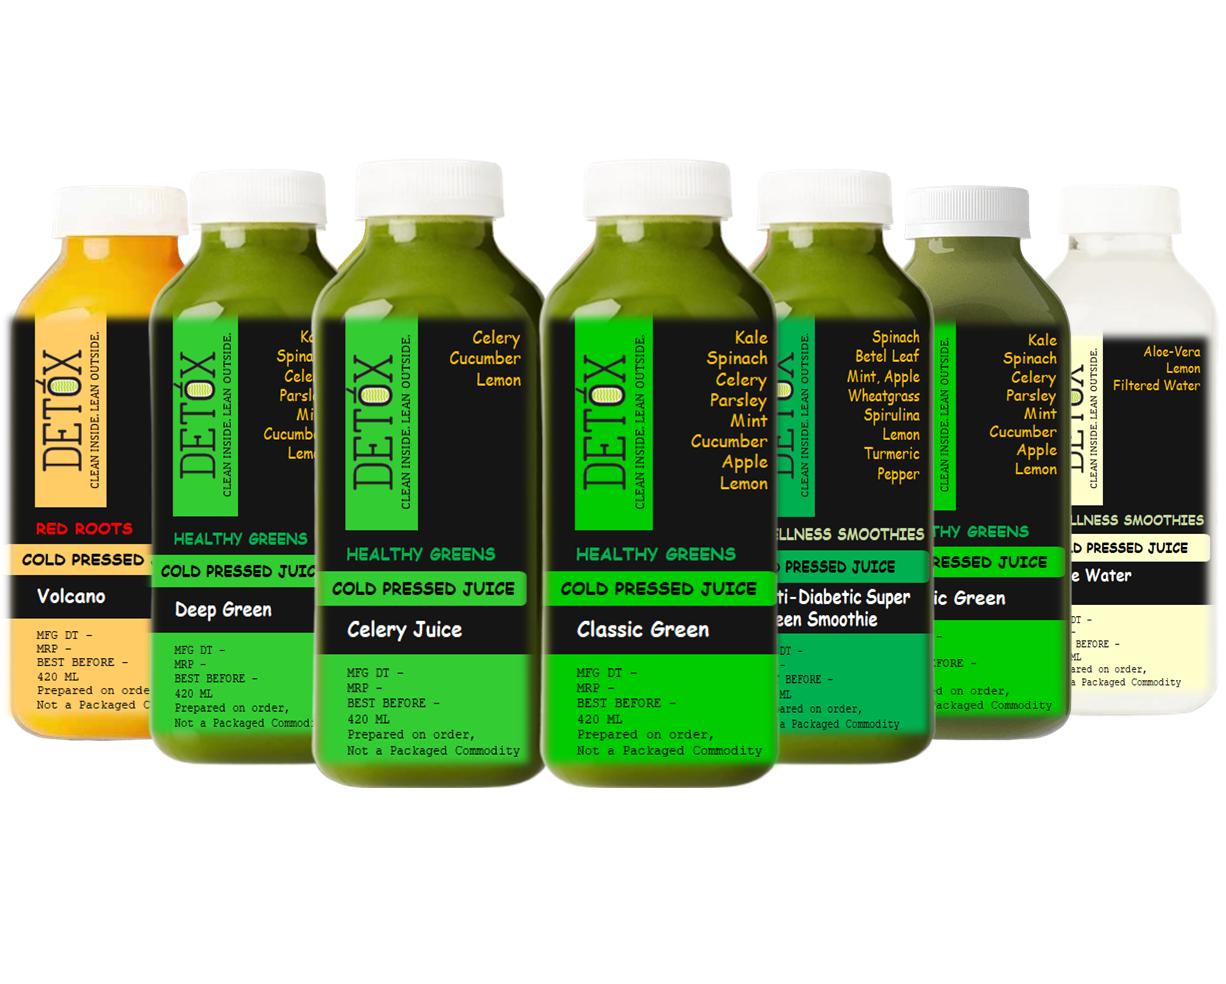 ADVANCED LOW SUGAR CLEANSE (420 ML X 6) - (CELERY JUICE + SUPER GREEN SMOOTHIE +  CLASSIC GREEN X 2 + DEEP GREEN  + VOLCANO ) + 250ML X ALOE WATER